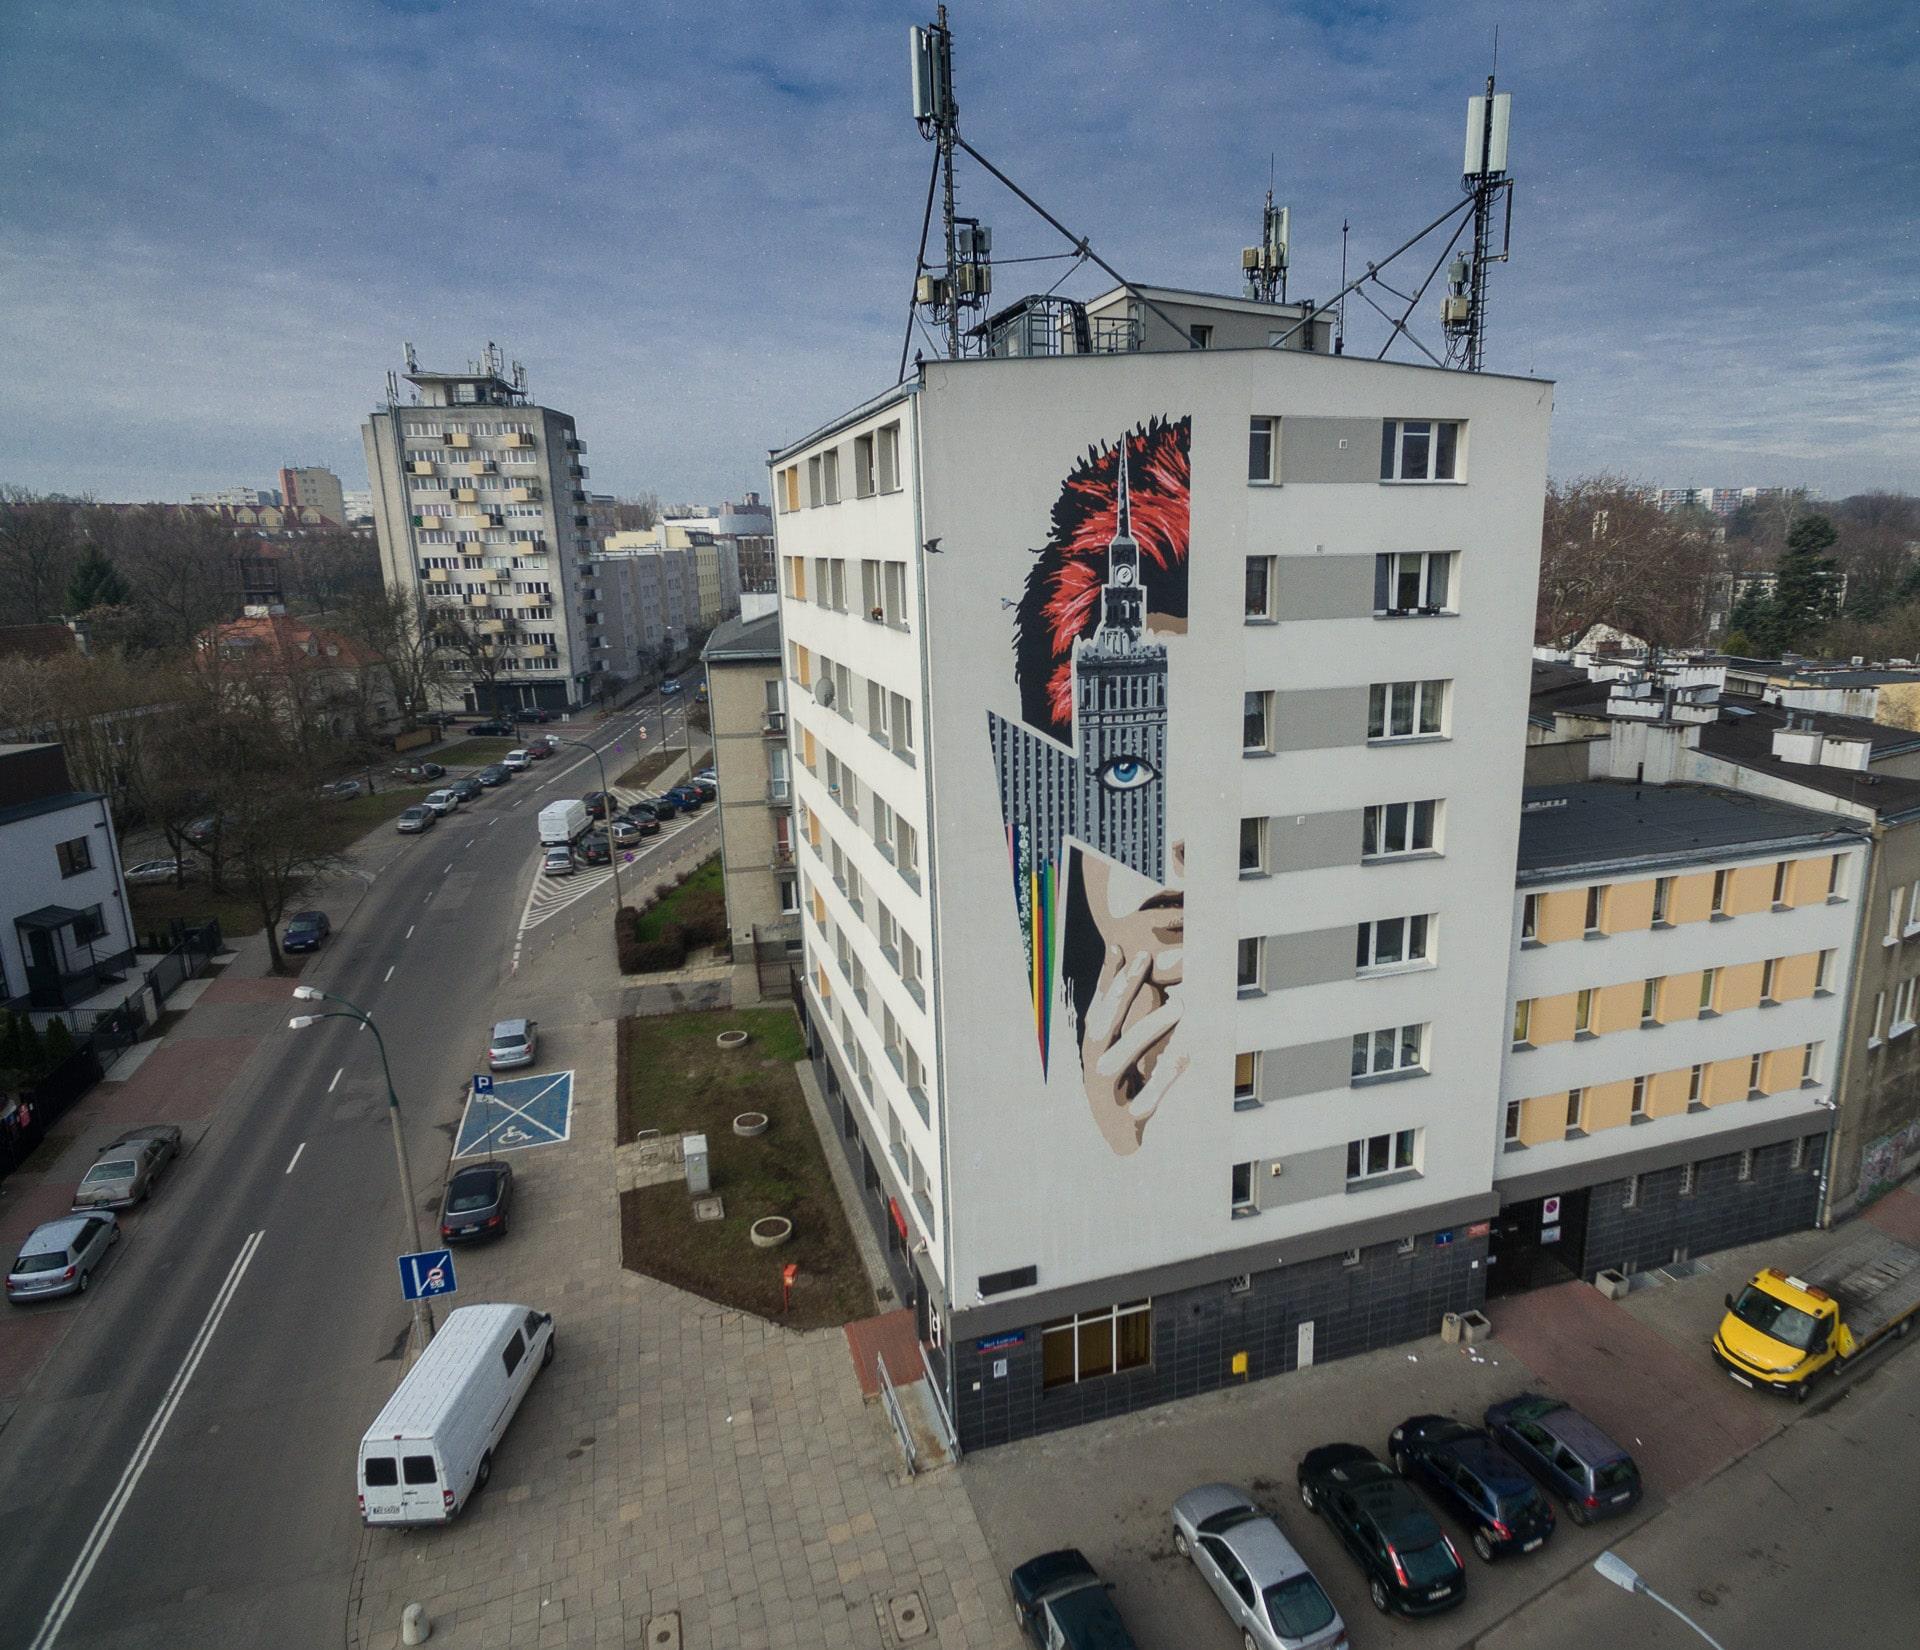 Mural David Bowie